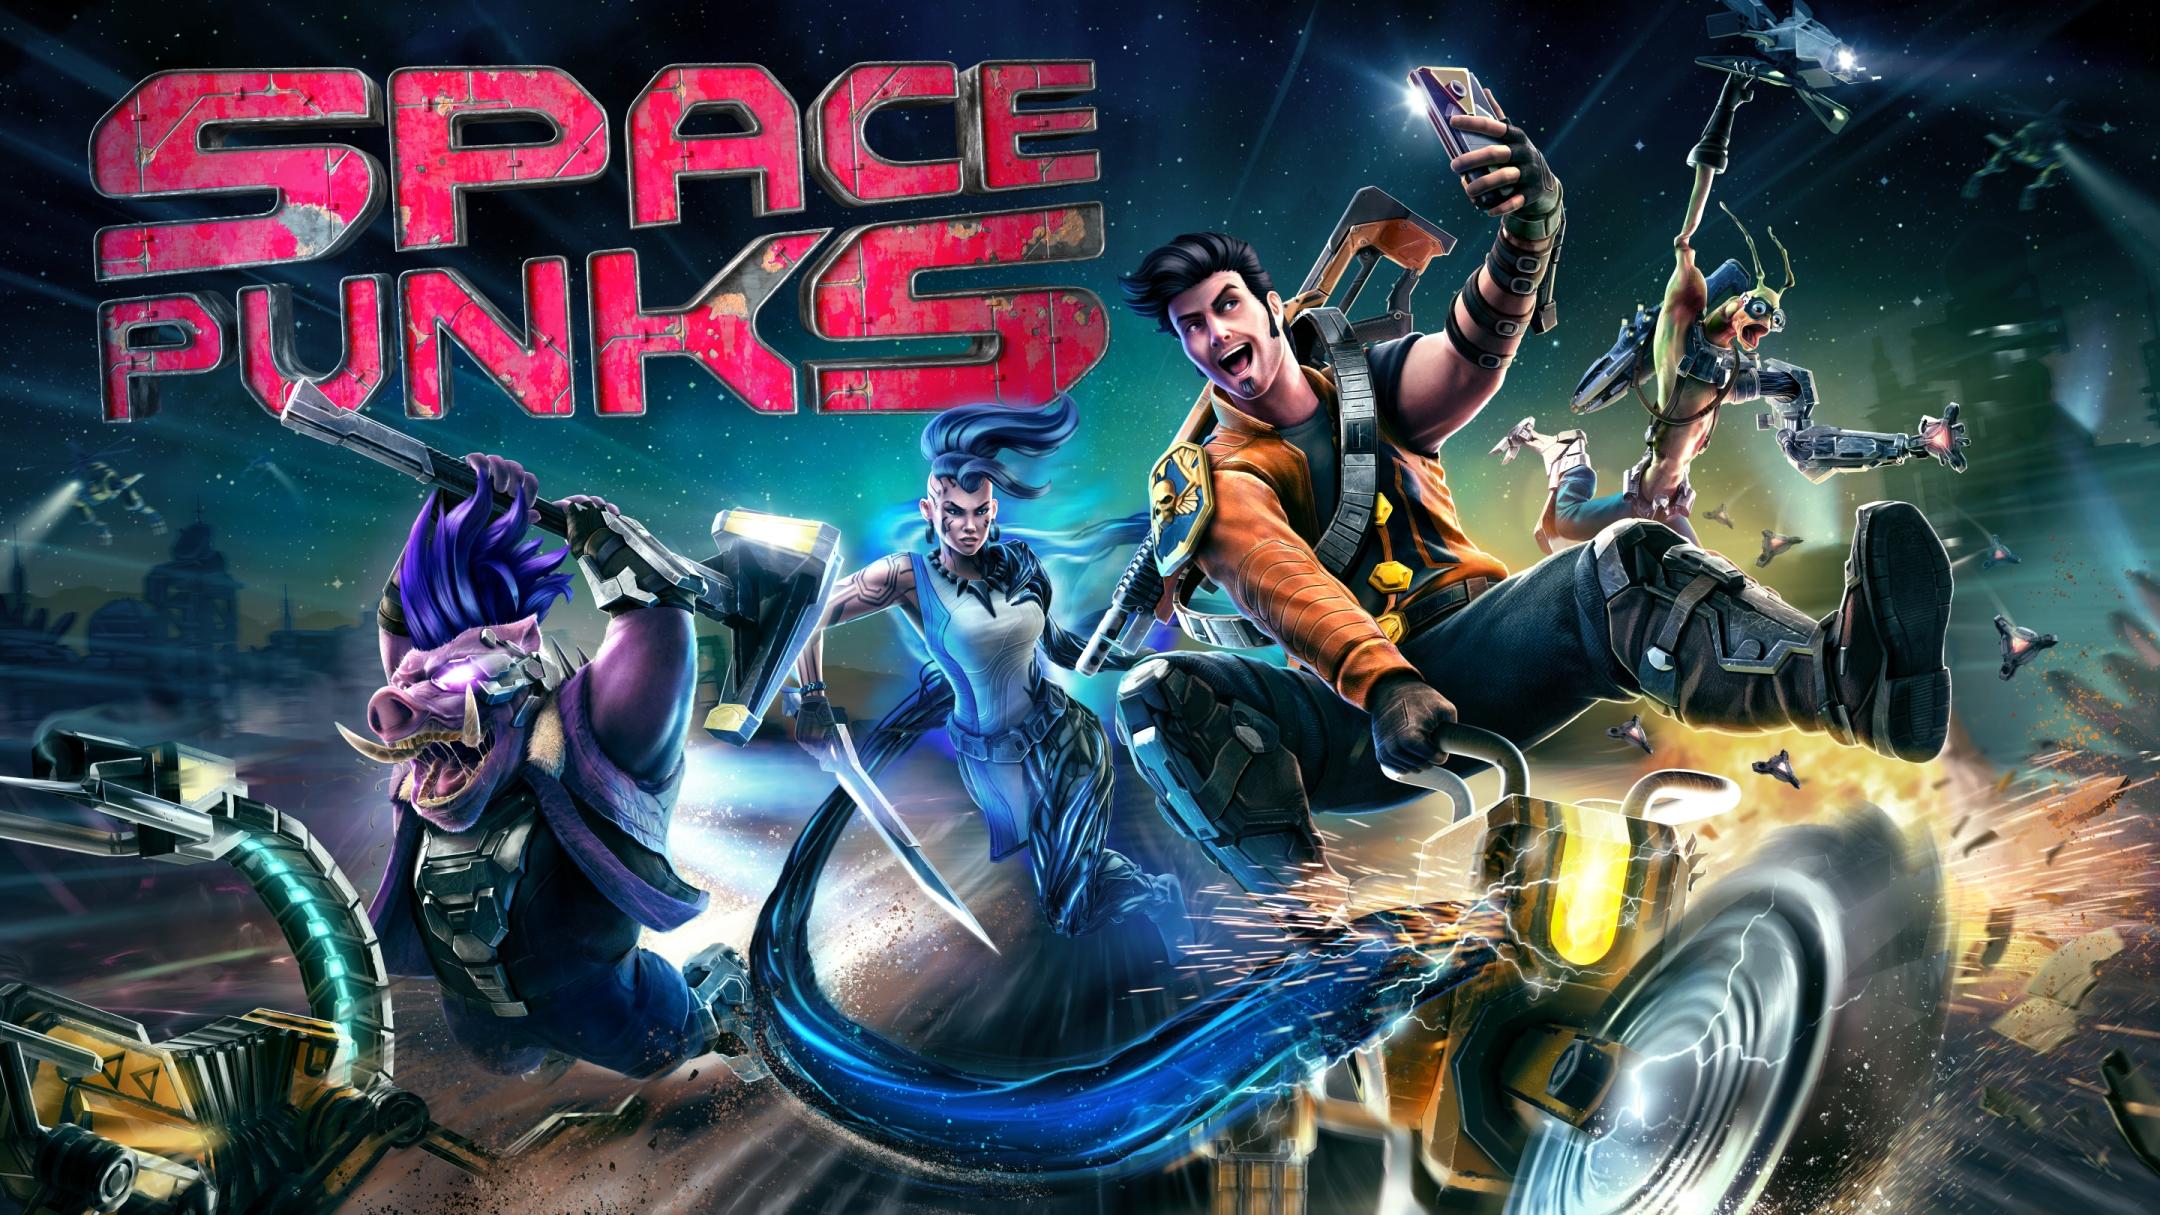 Space Punks: Twin Stick Shooter Meets Borderlands - First Trailer